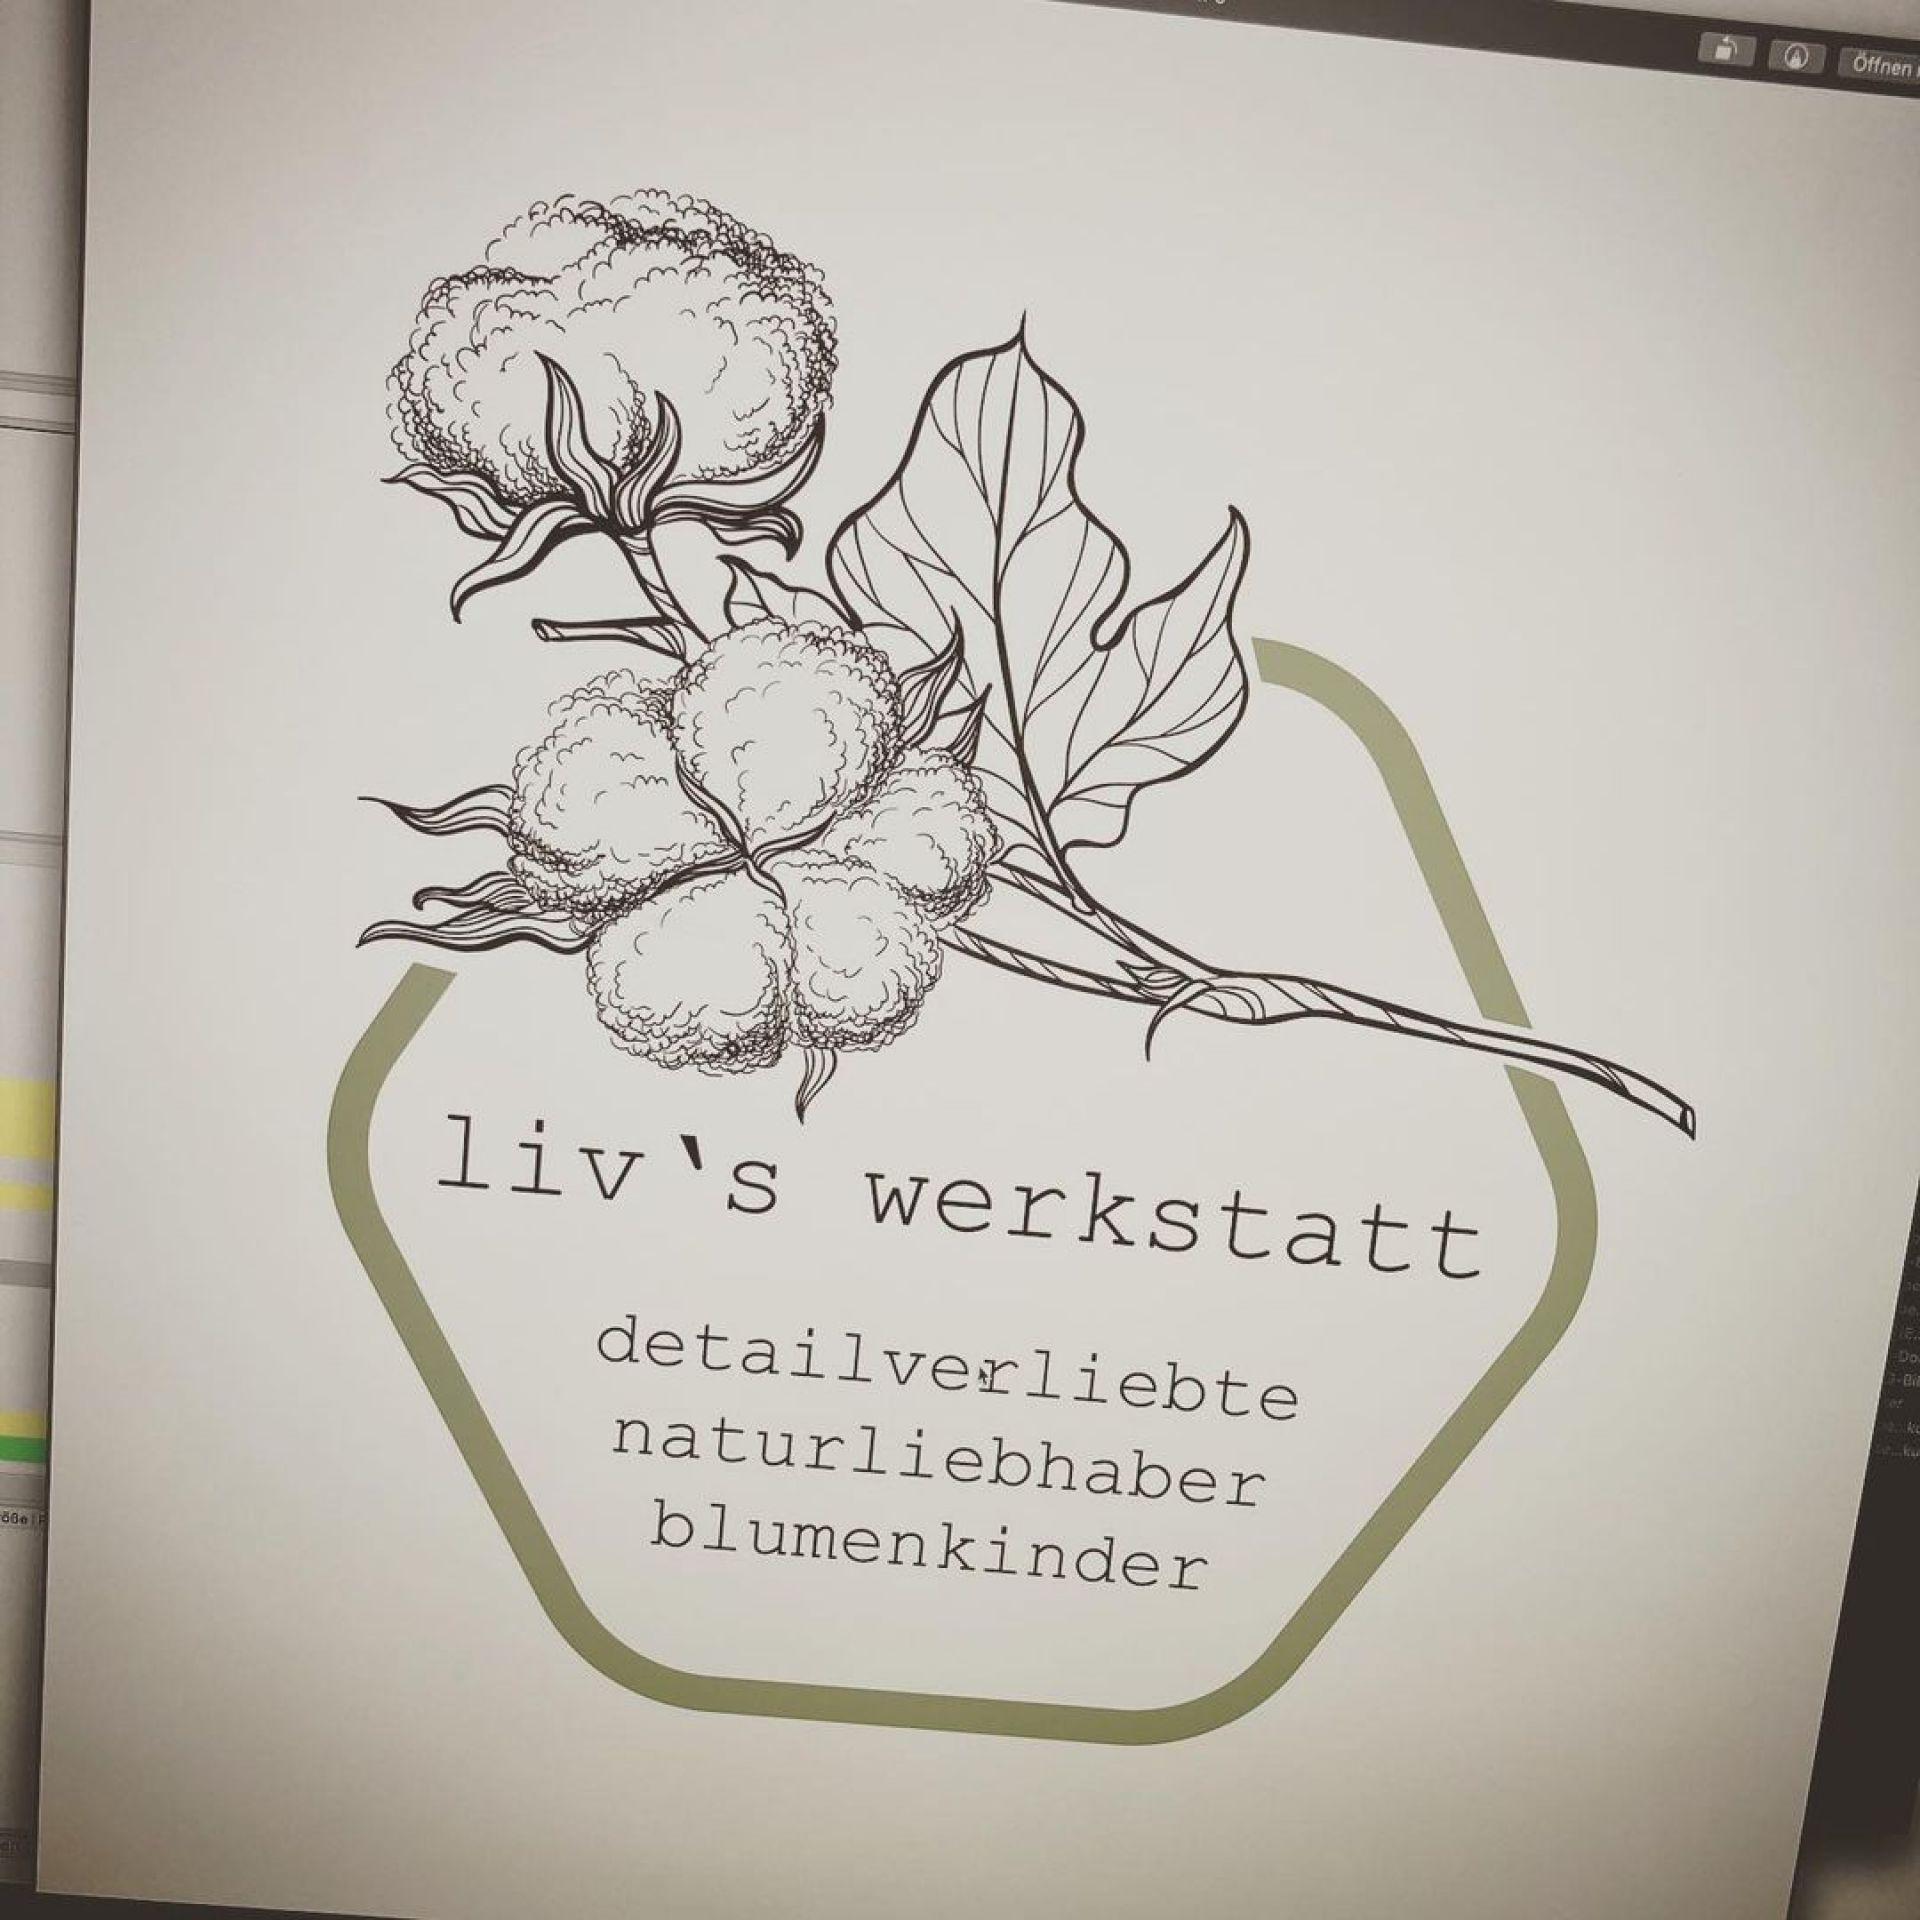 Liv's Werkstatt